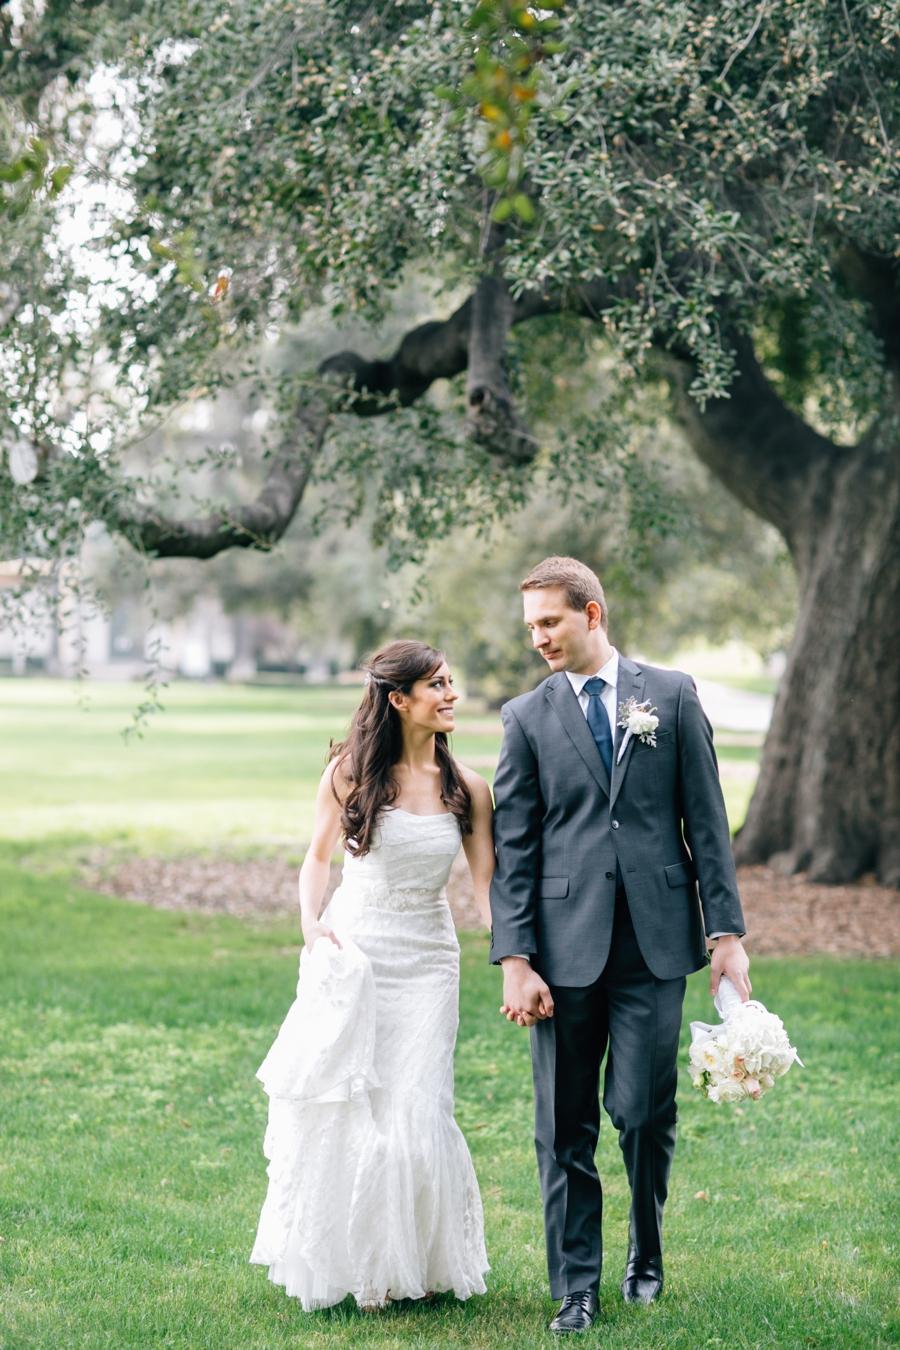 247_University_Of_Redlands_Redlands_California_Wedding_Photo.JPG